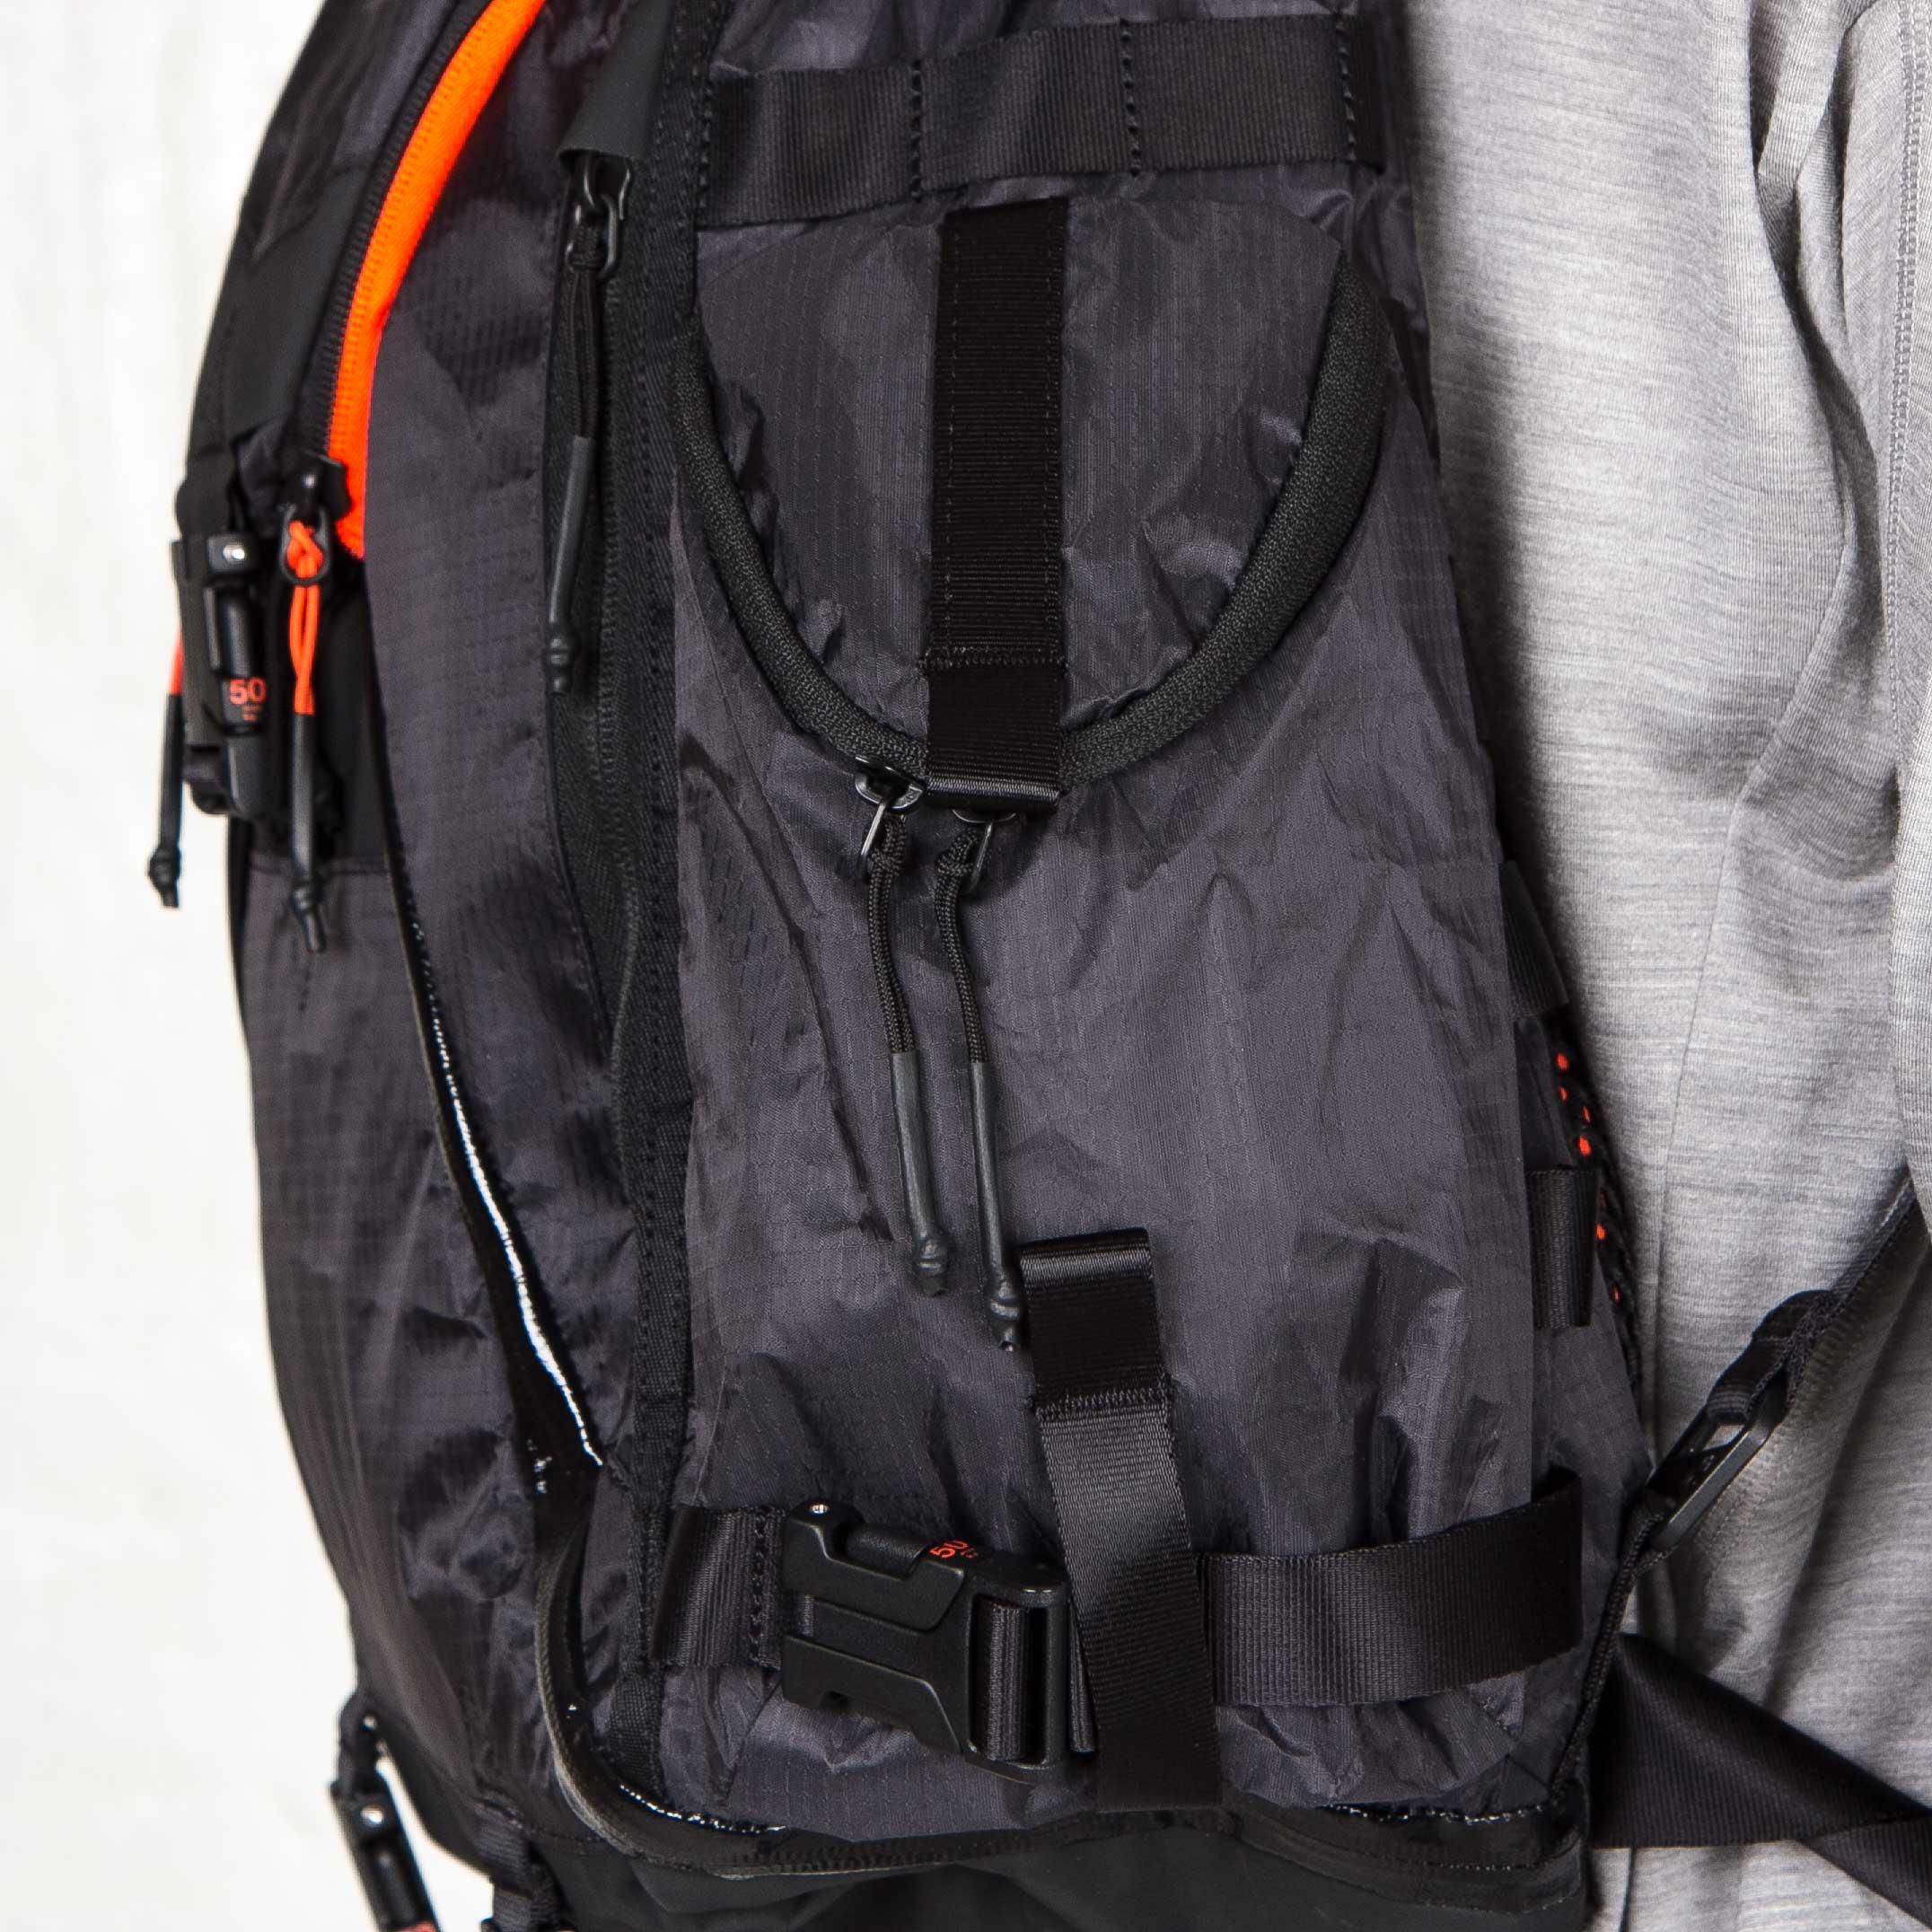 4c91a8a3c910 Nike ACG Responder Backpack - BA5279-010 - Sneakersnstuff